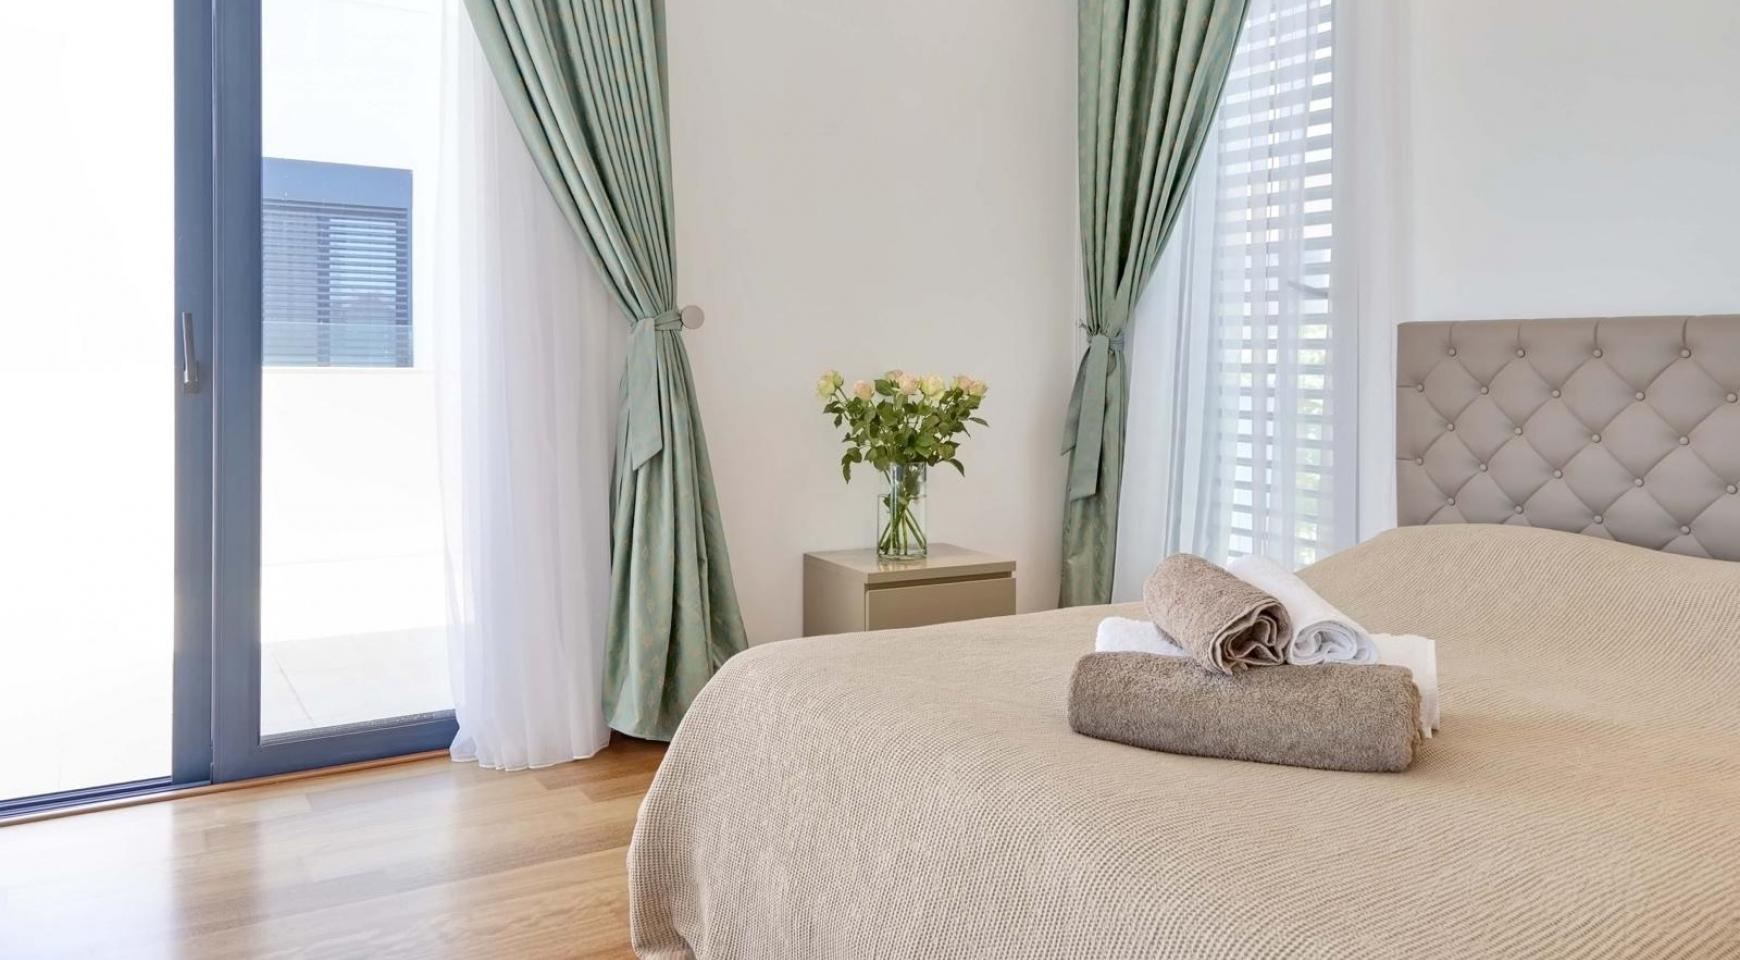 New Luxurious 4 Bedroom Villa in the Tourist Area - 38